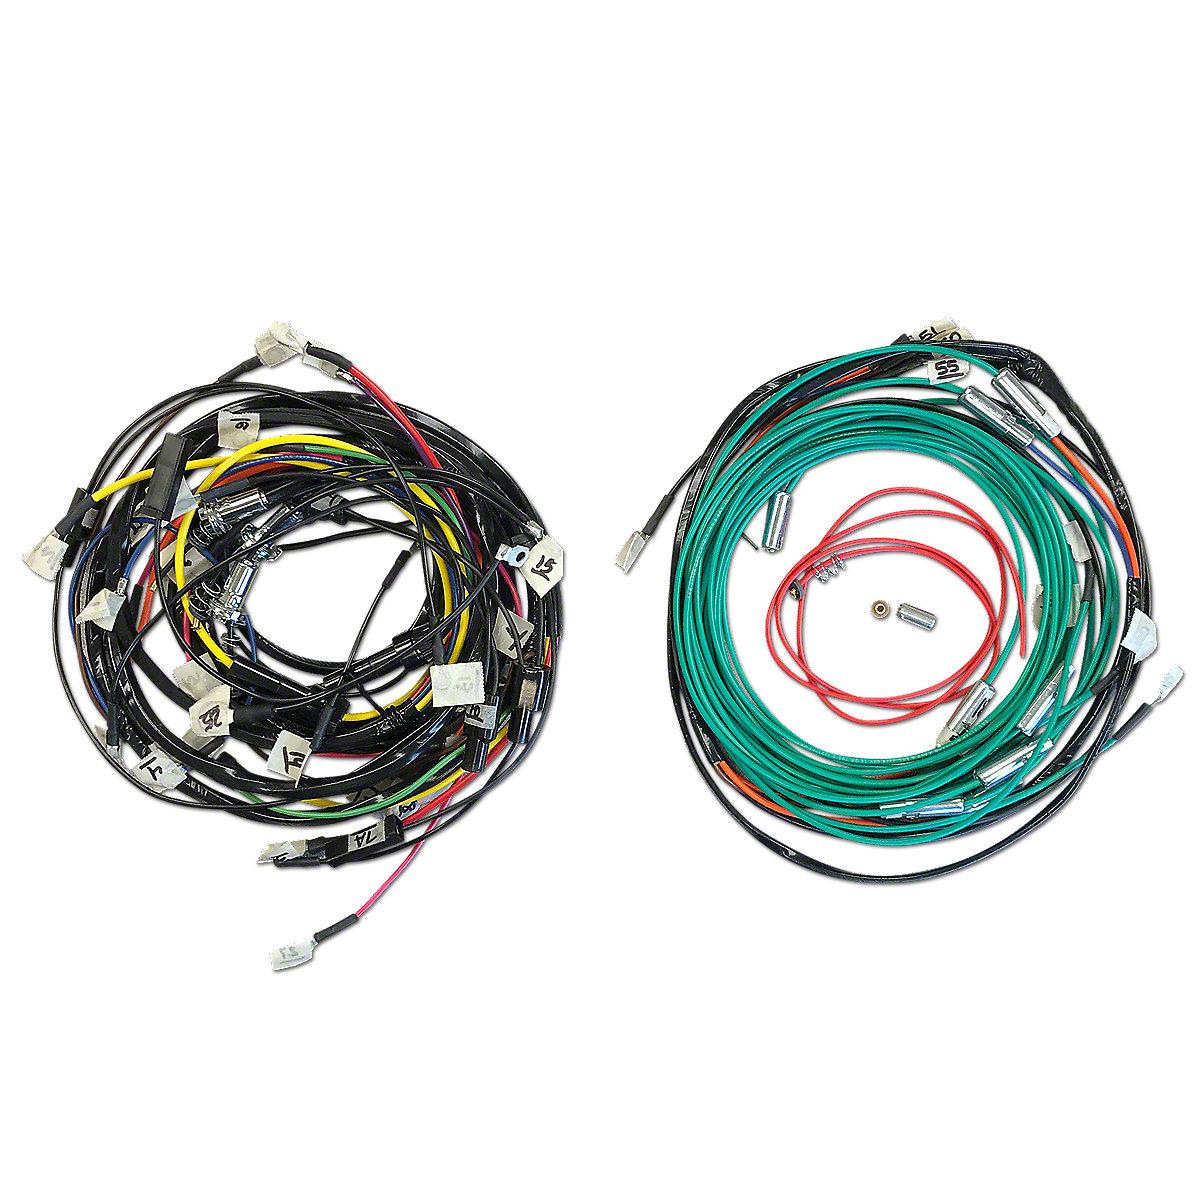 OLS3847Restoration Quality Wiring Harness